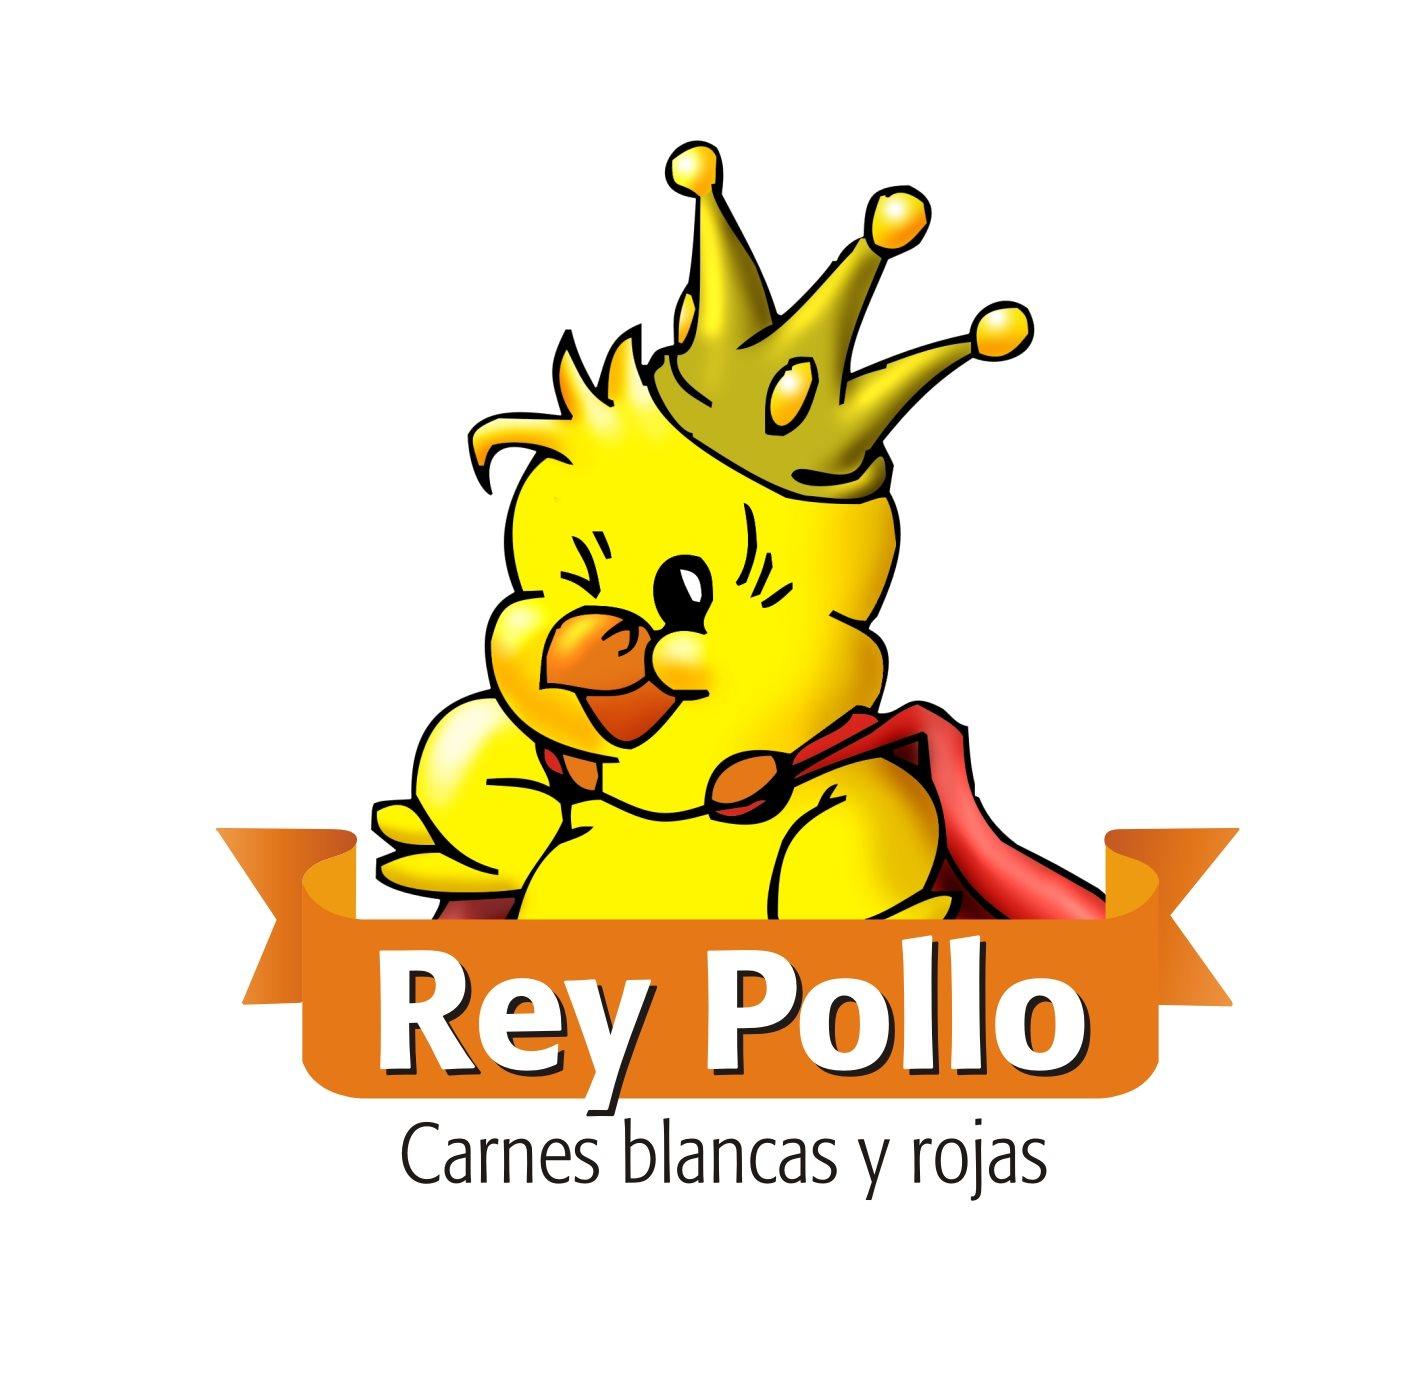 Rey Pollo